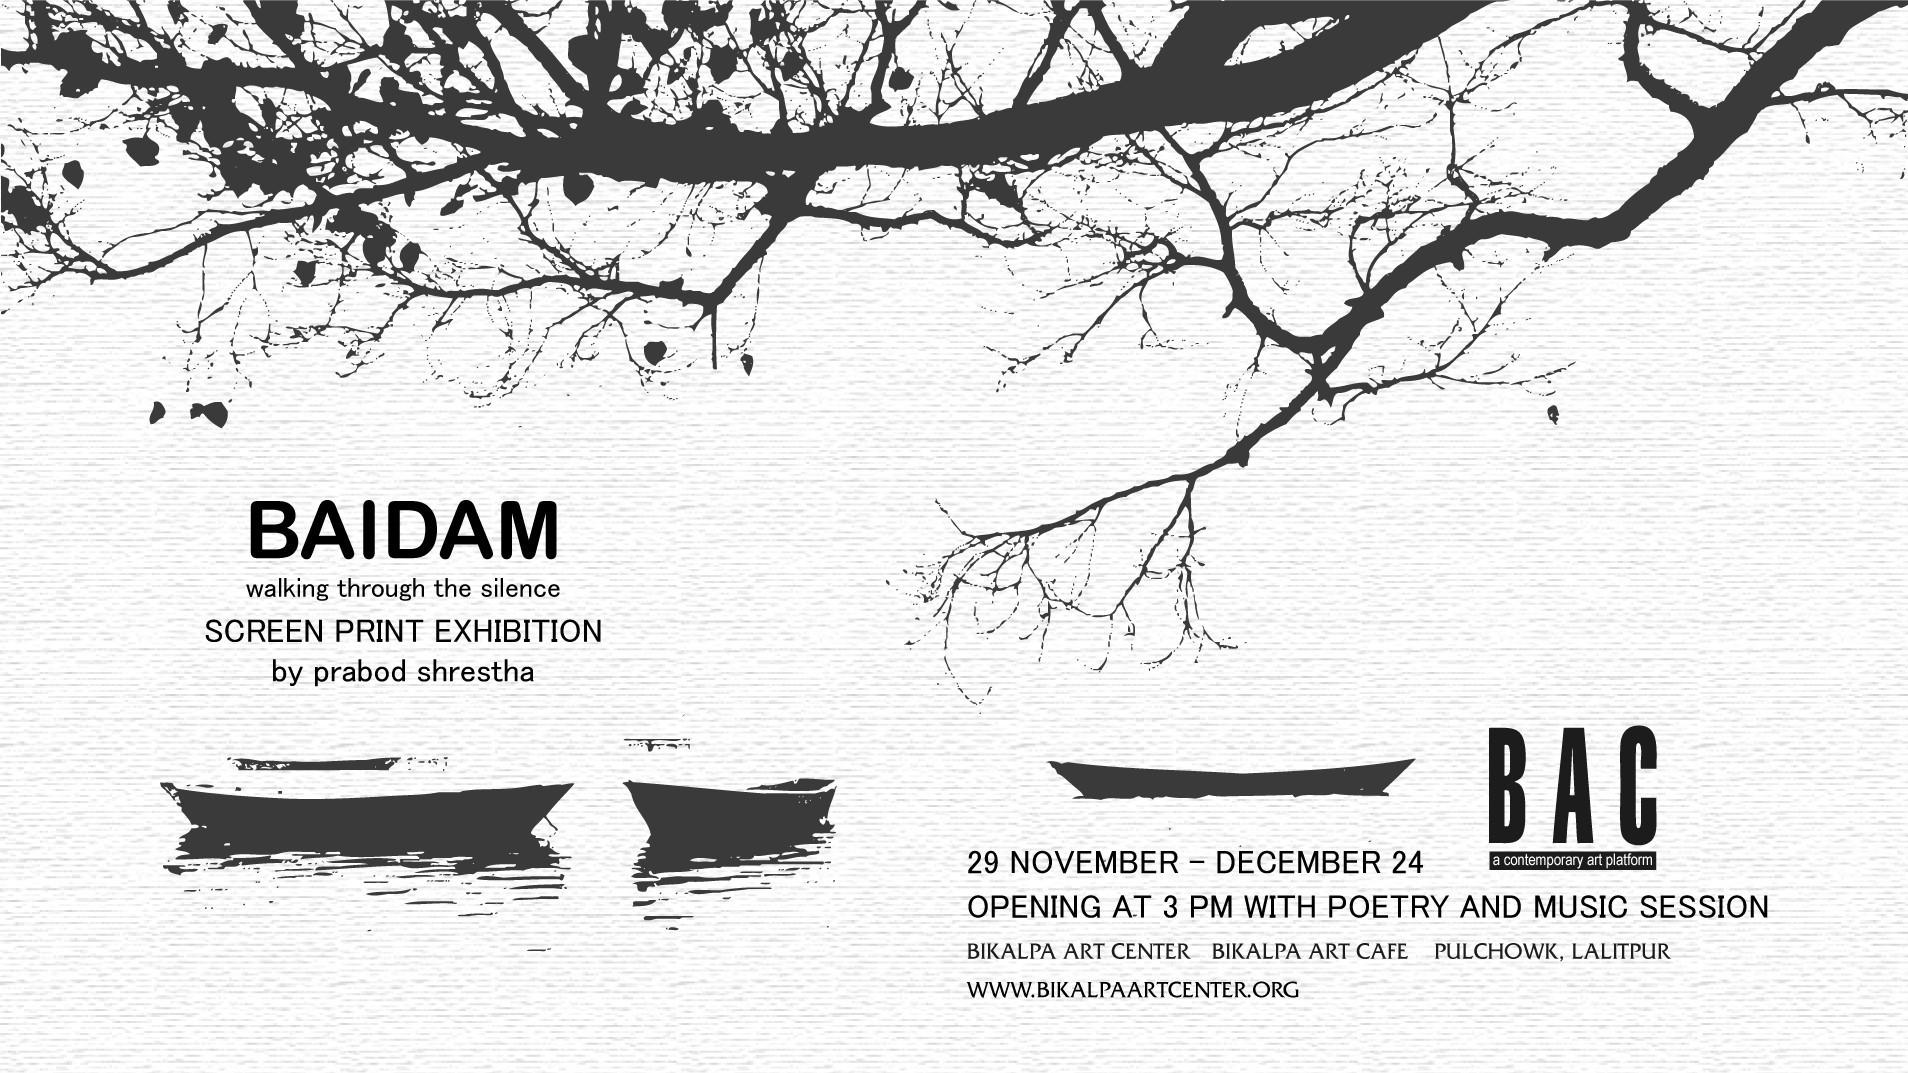 Baidam, walking through silence screen print exhibition